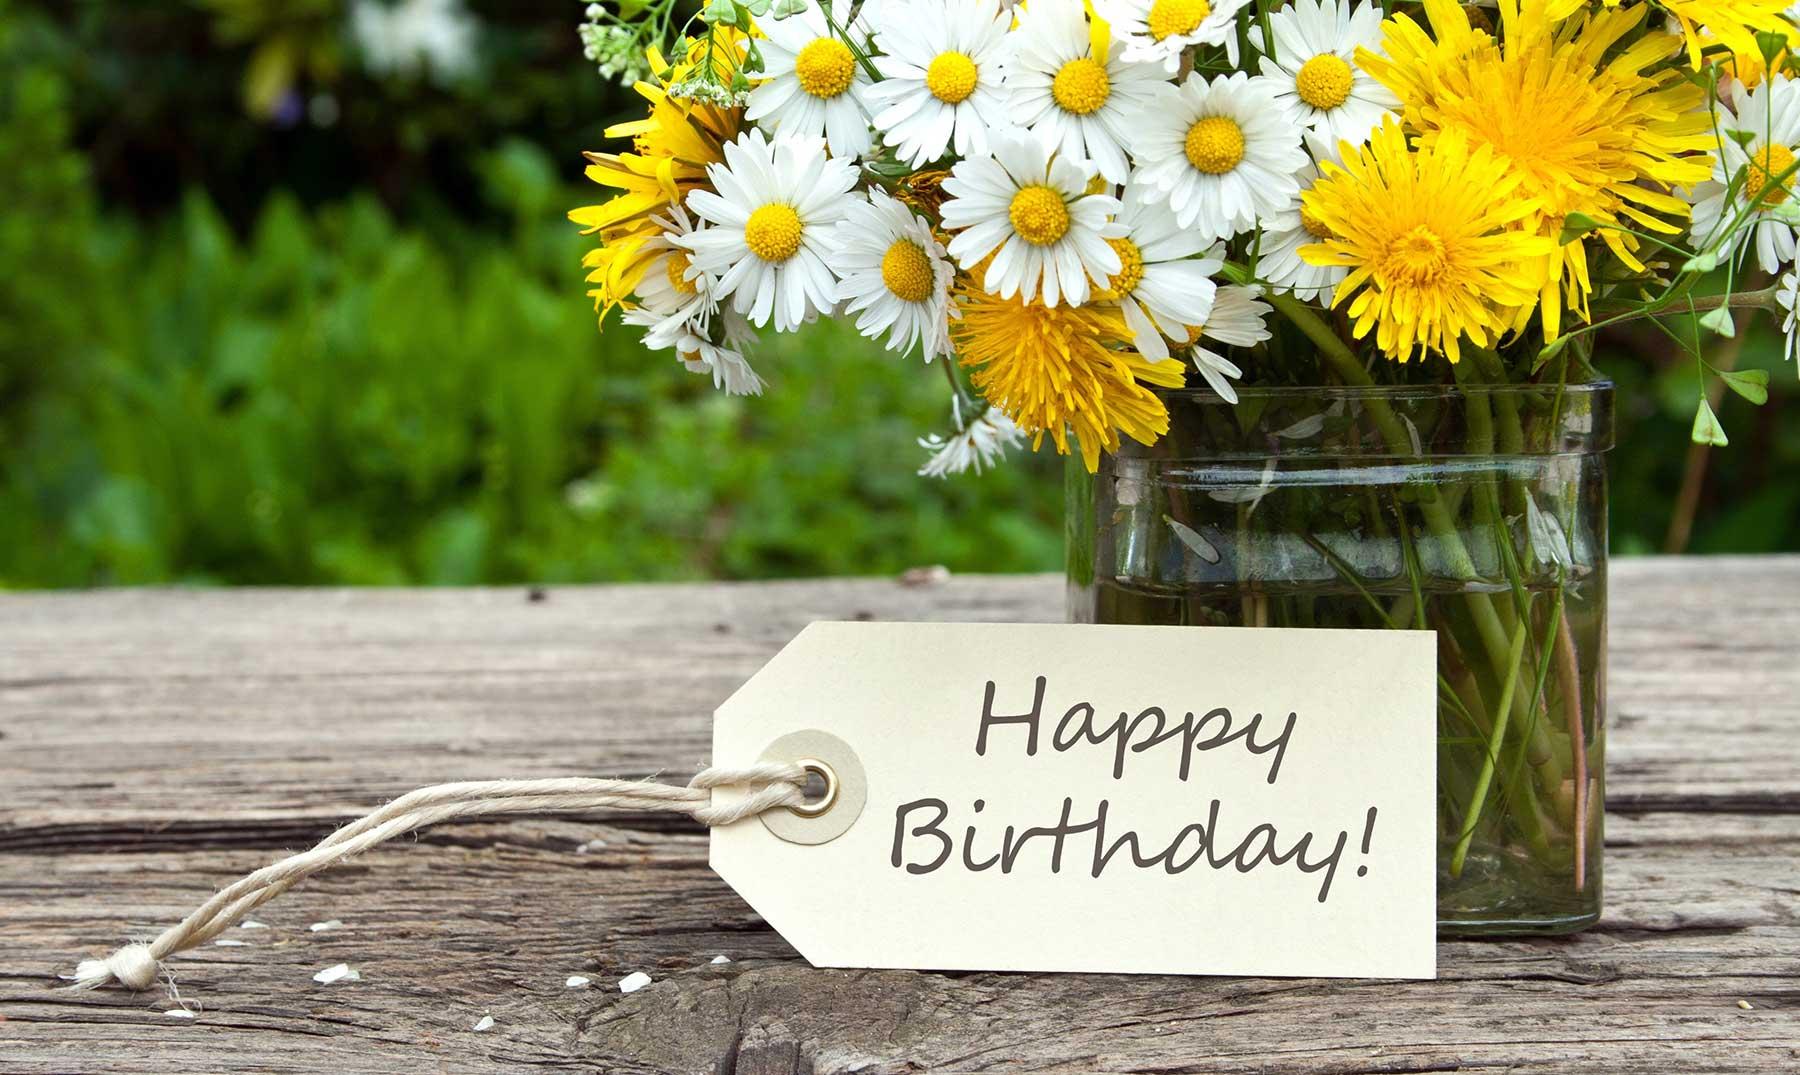 100 Frases De Cumpleaños Para Una Tarjeta